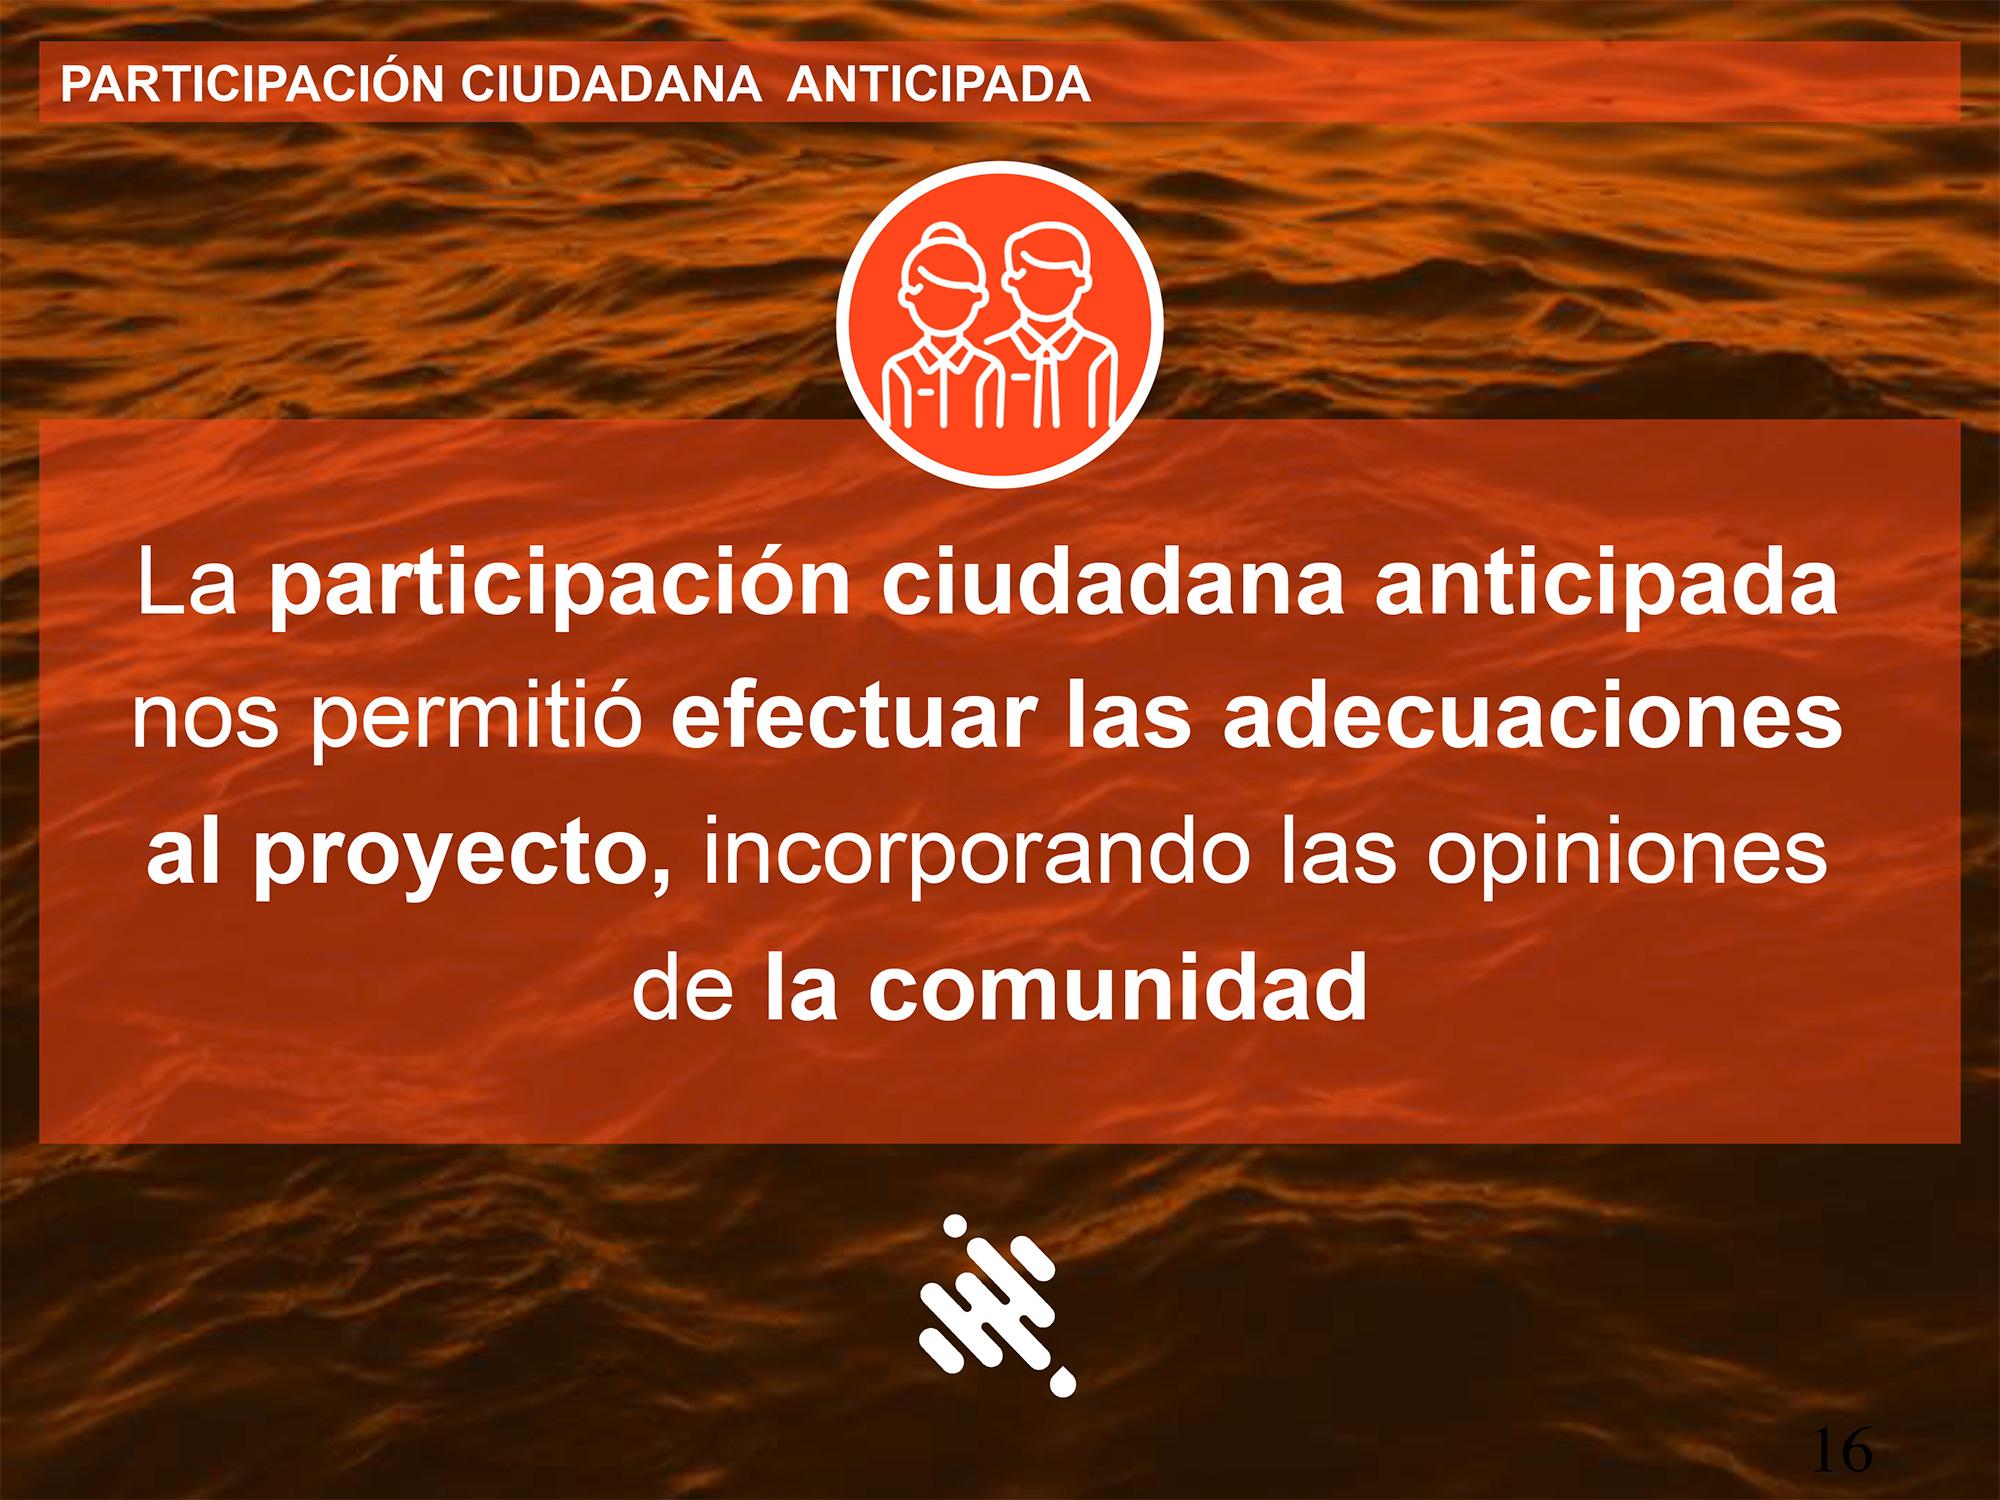 AP_Proyecto_Aconcagua-16.jpg